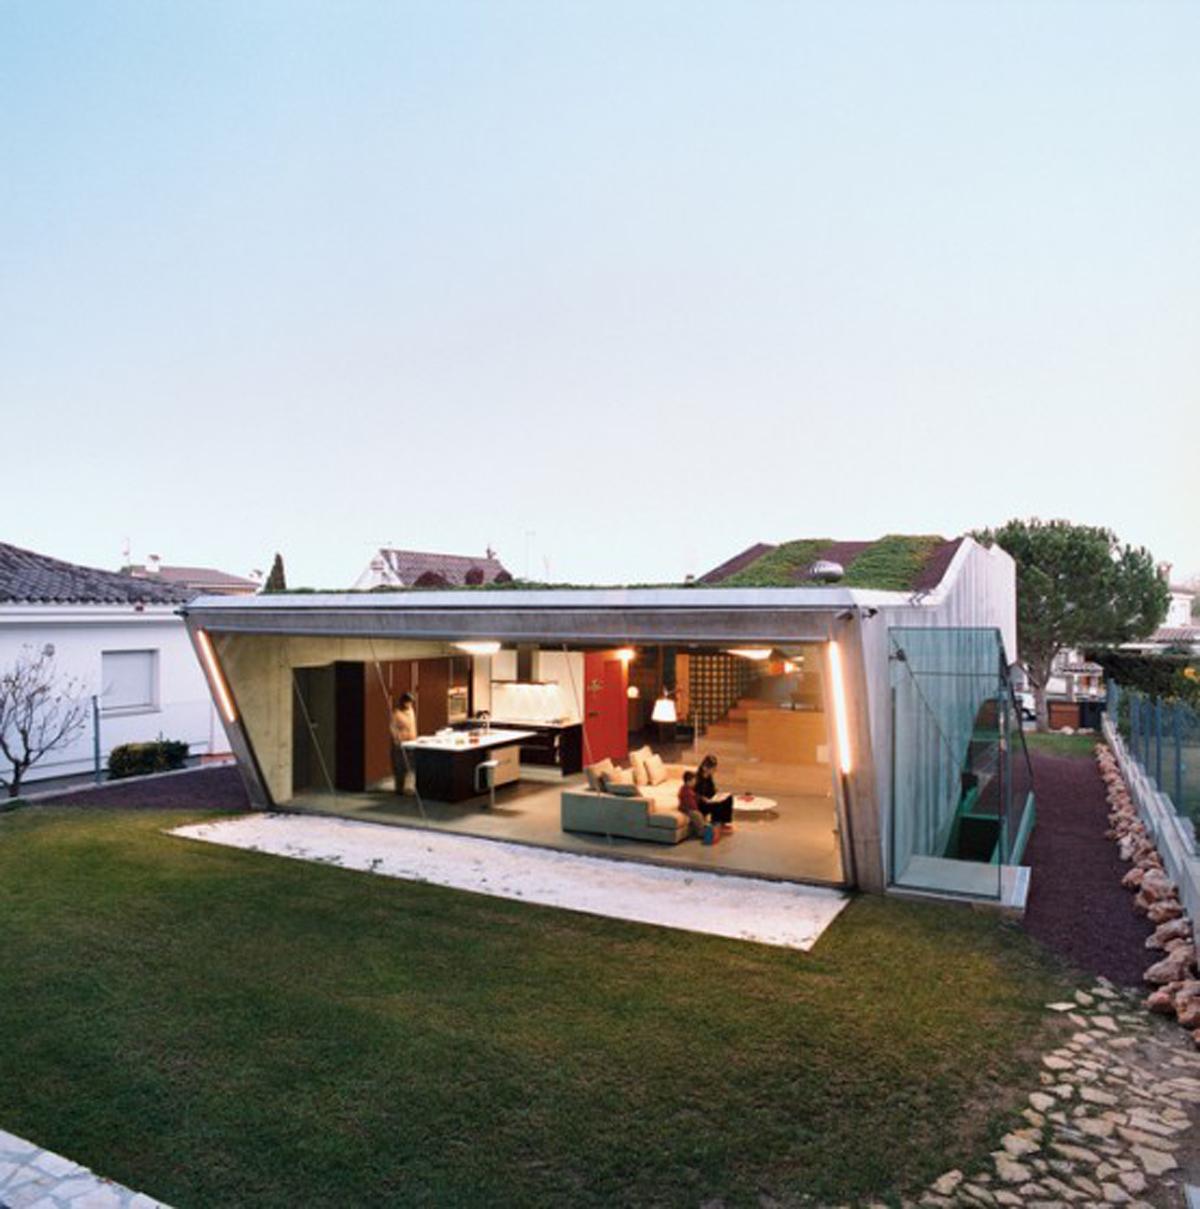 Rooftop Garden In Glass House Design Viahouse Com